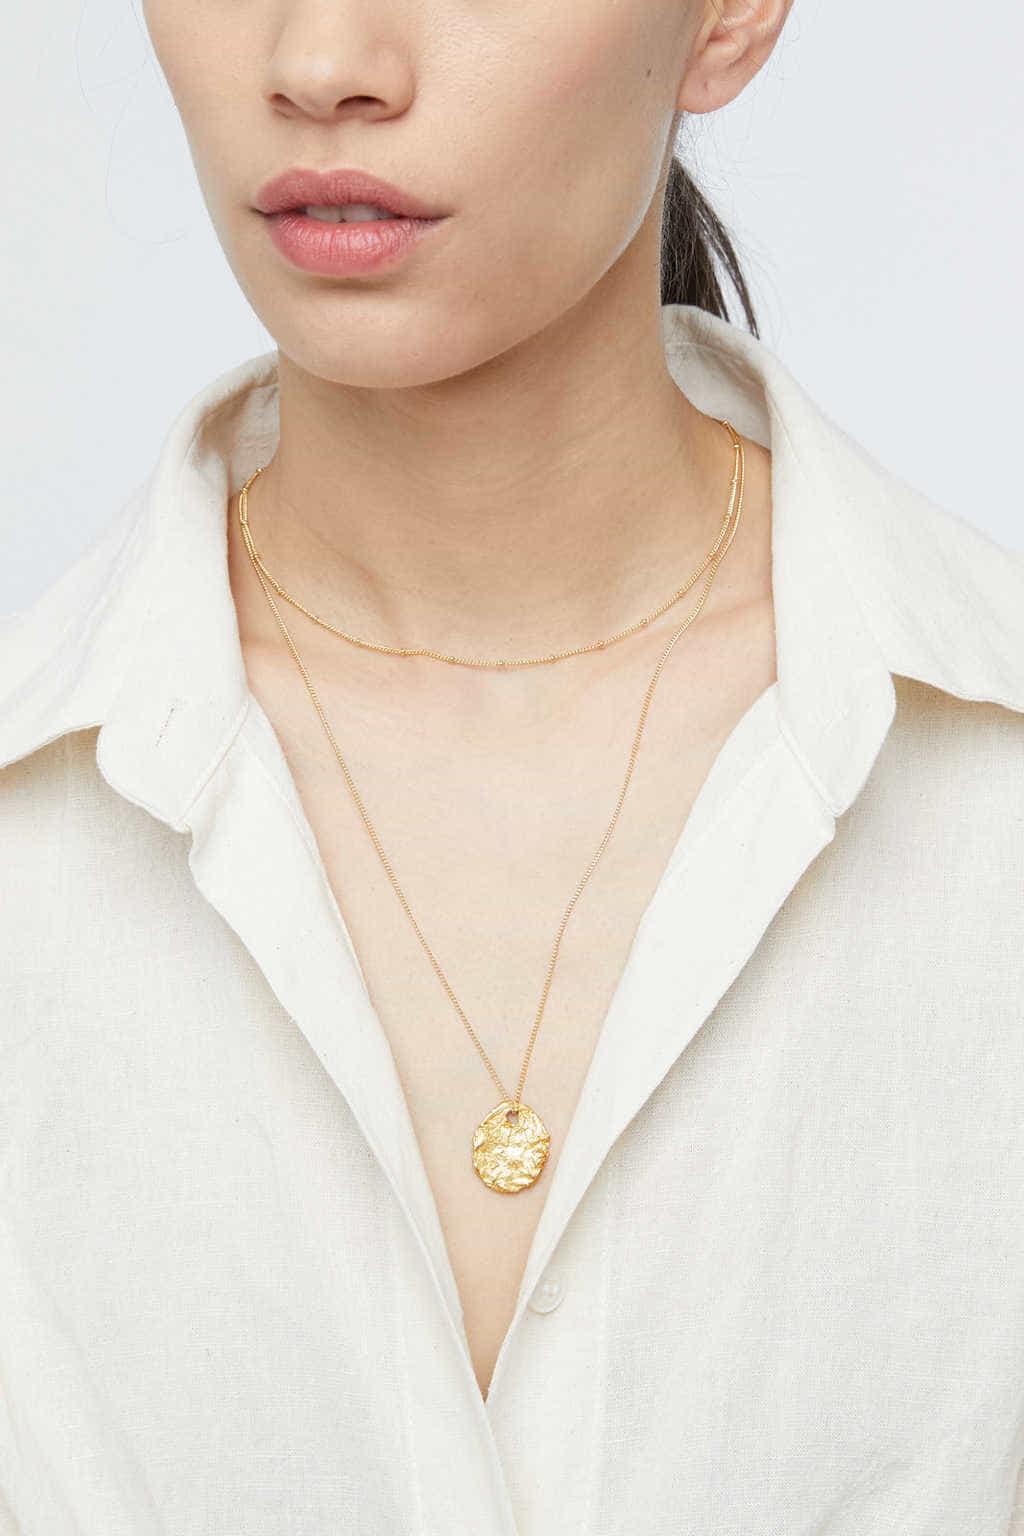 Necklace K002 Gold 1